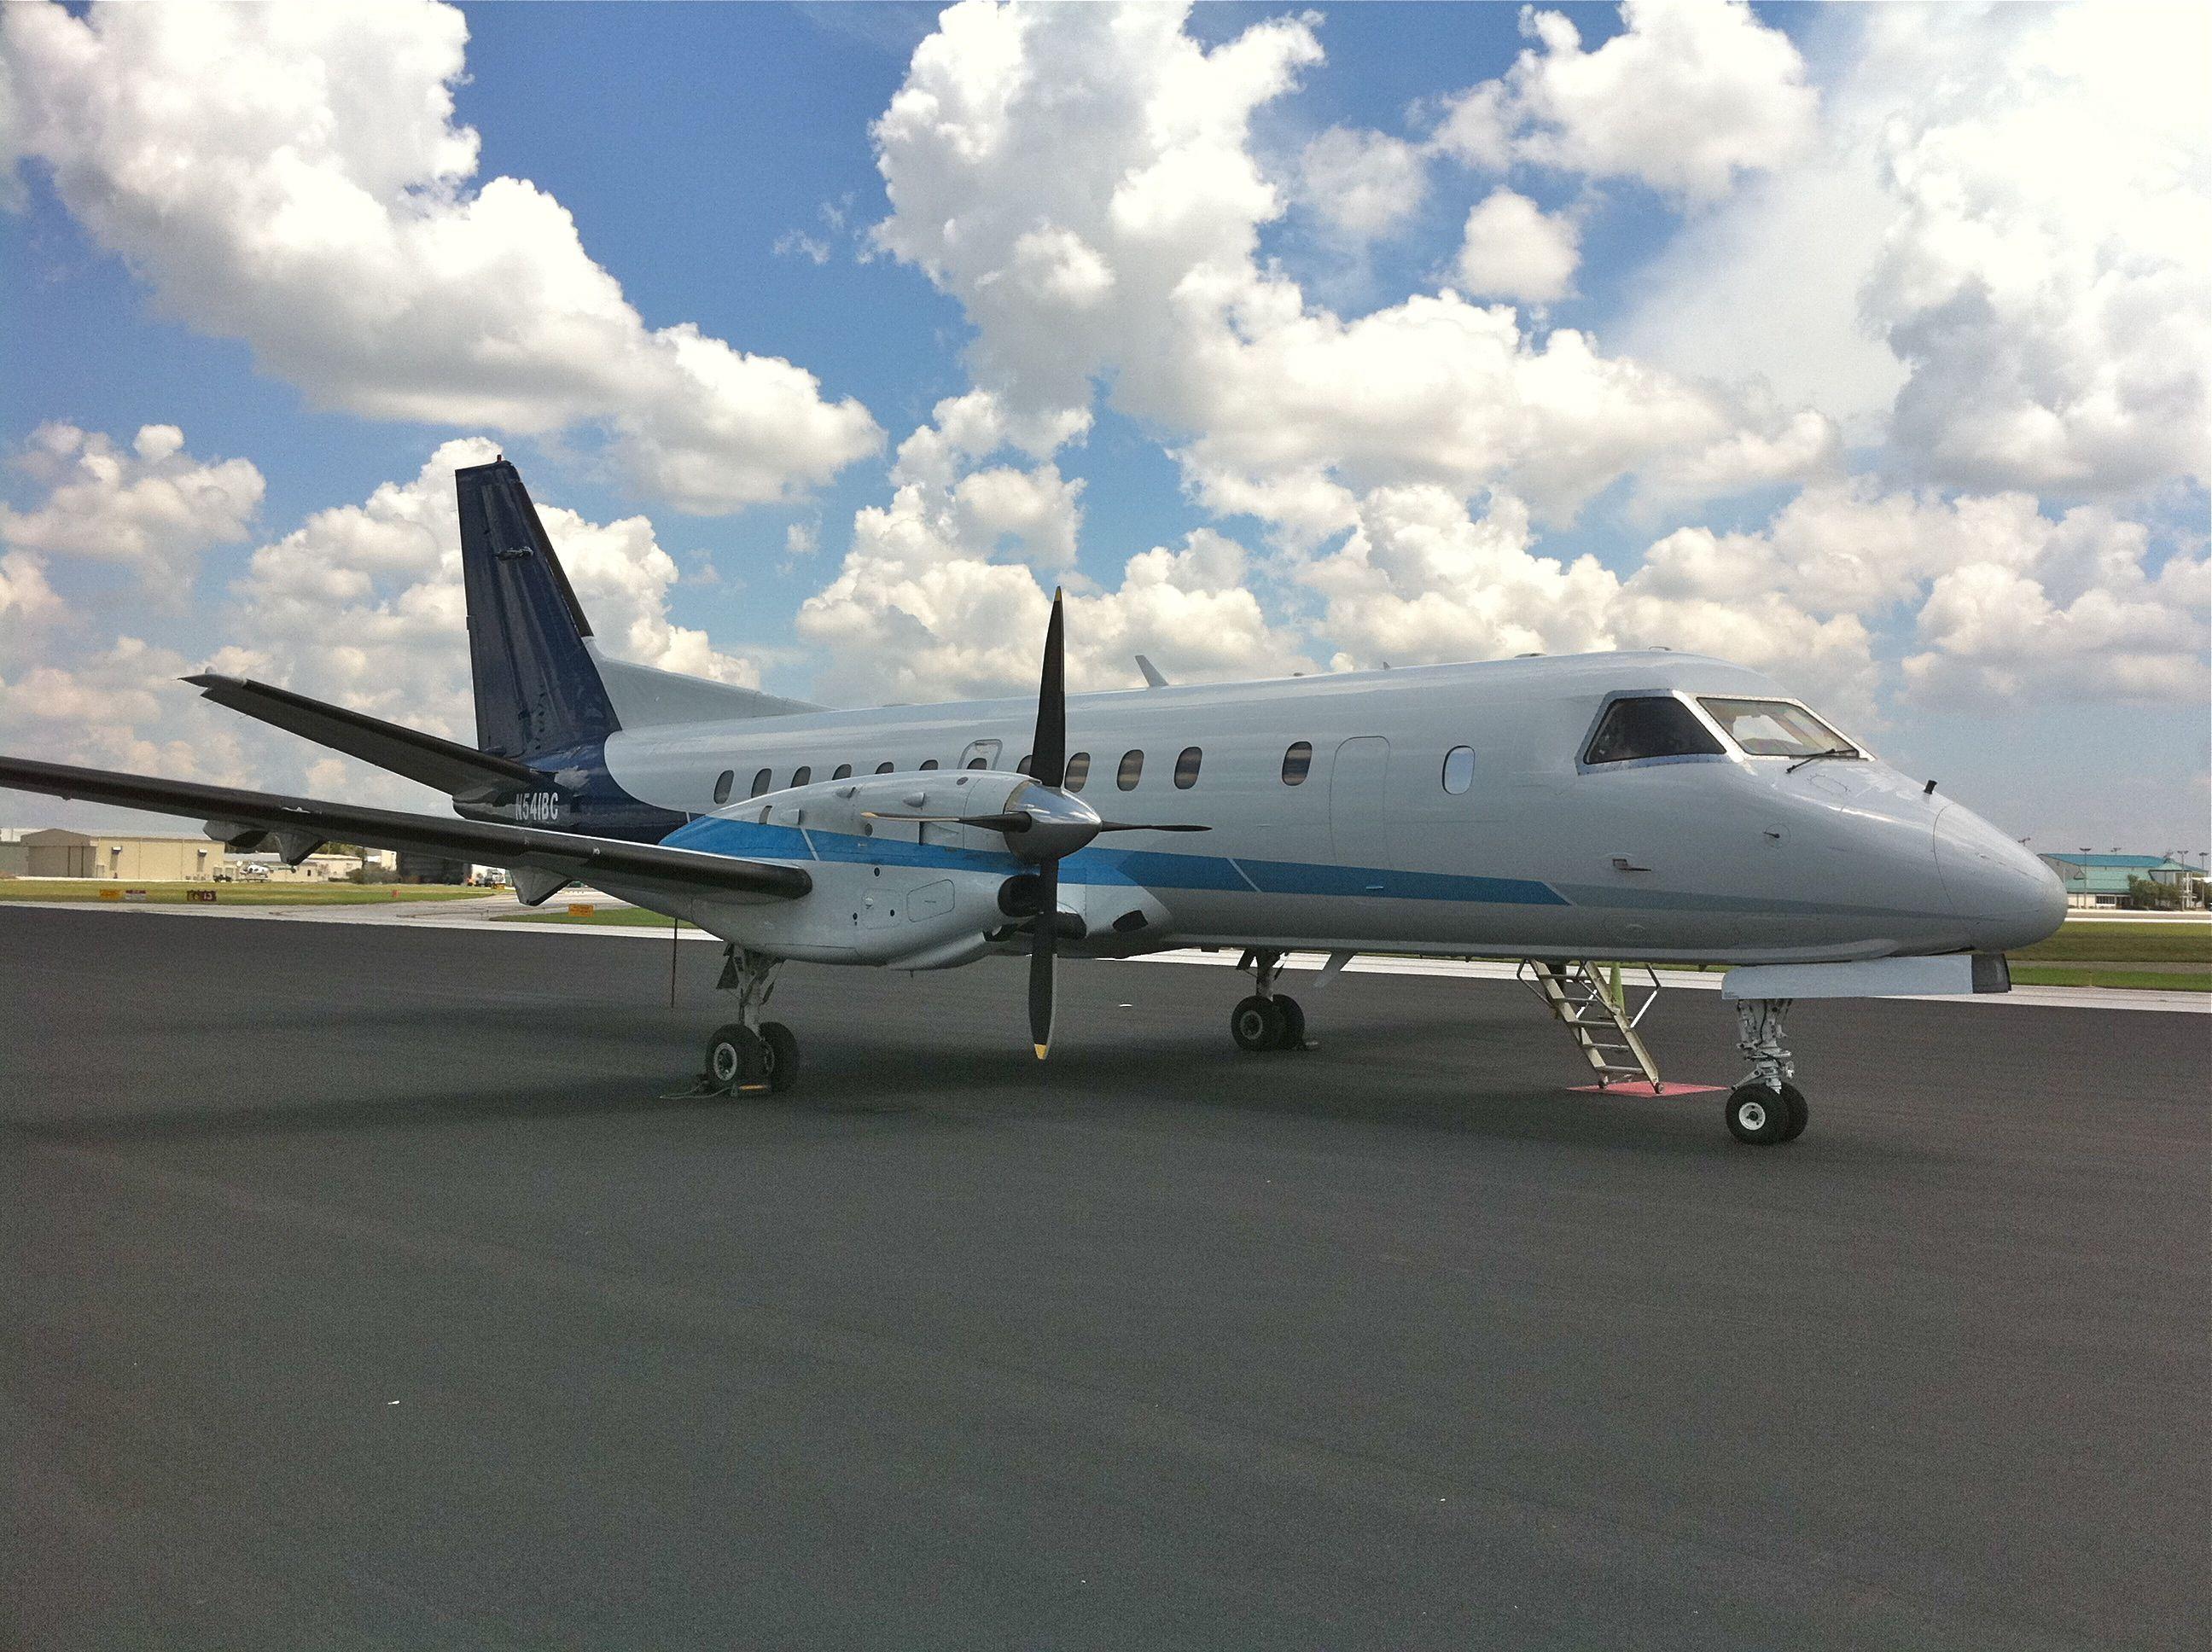 Saab 340a Luxury jets, Aircraft, Jet